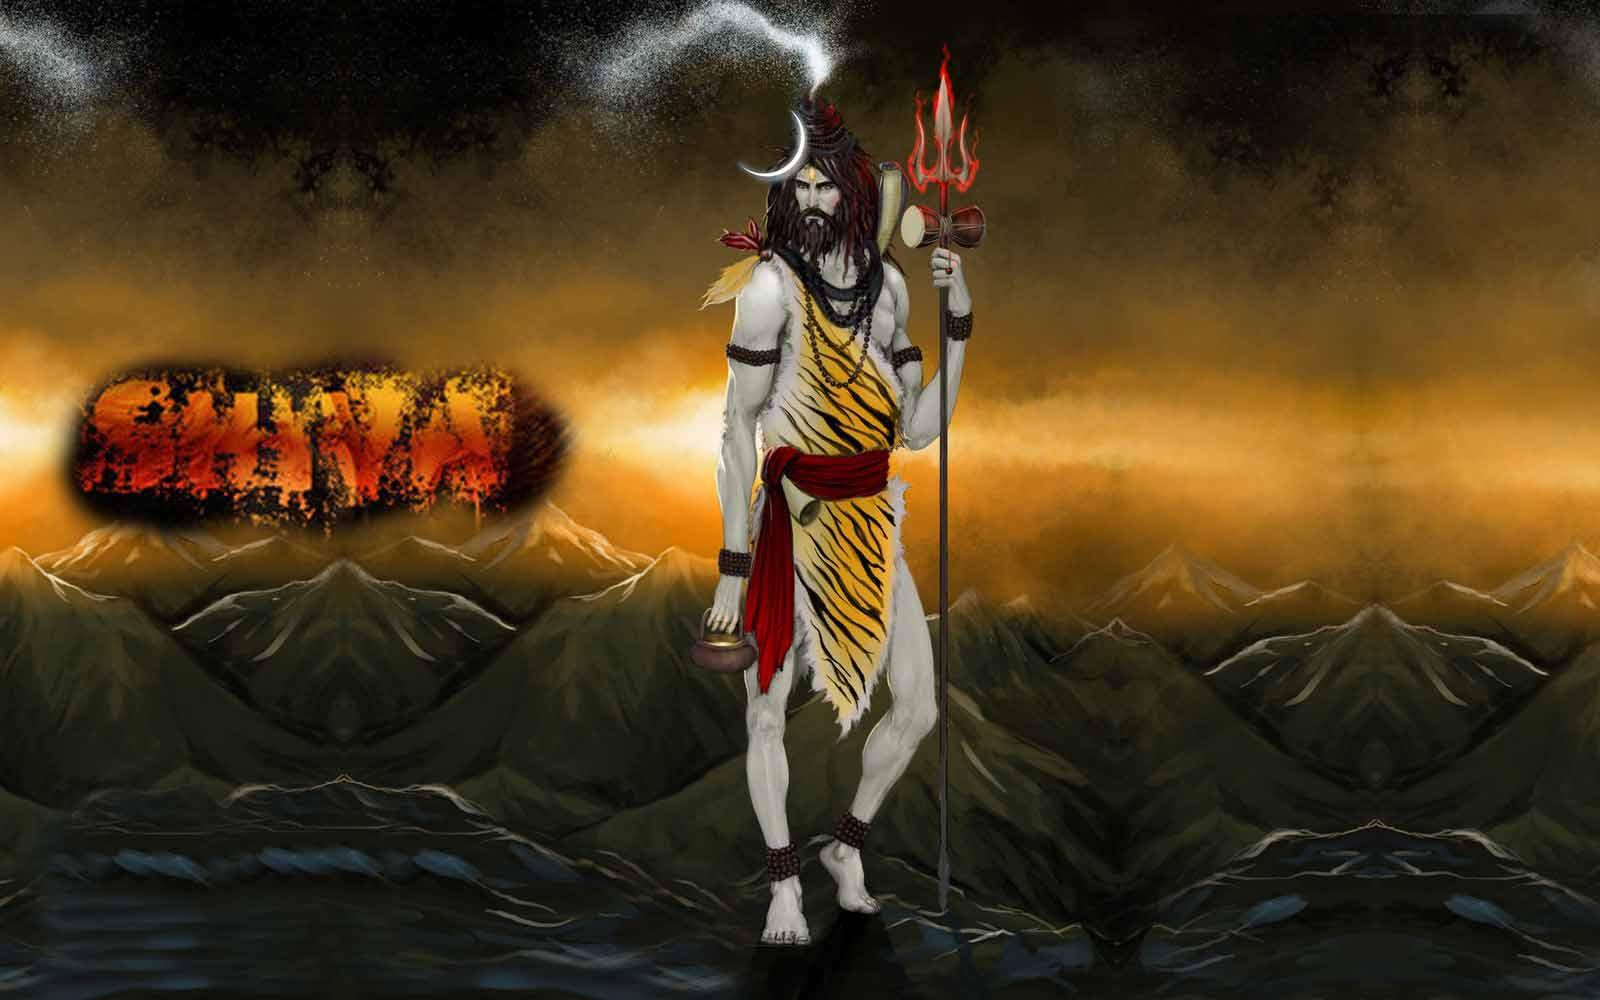 Mahadev Wallpaper Lord Shiva Wallpapers For Android Apk